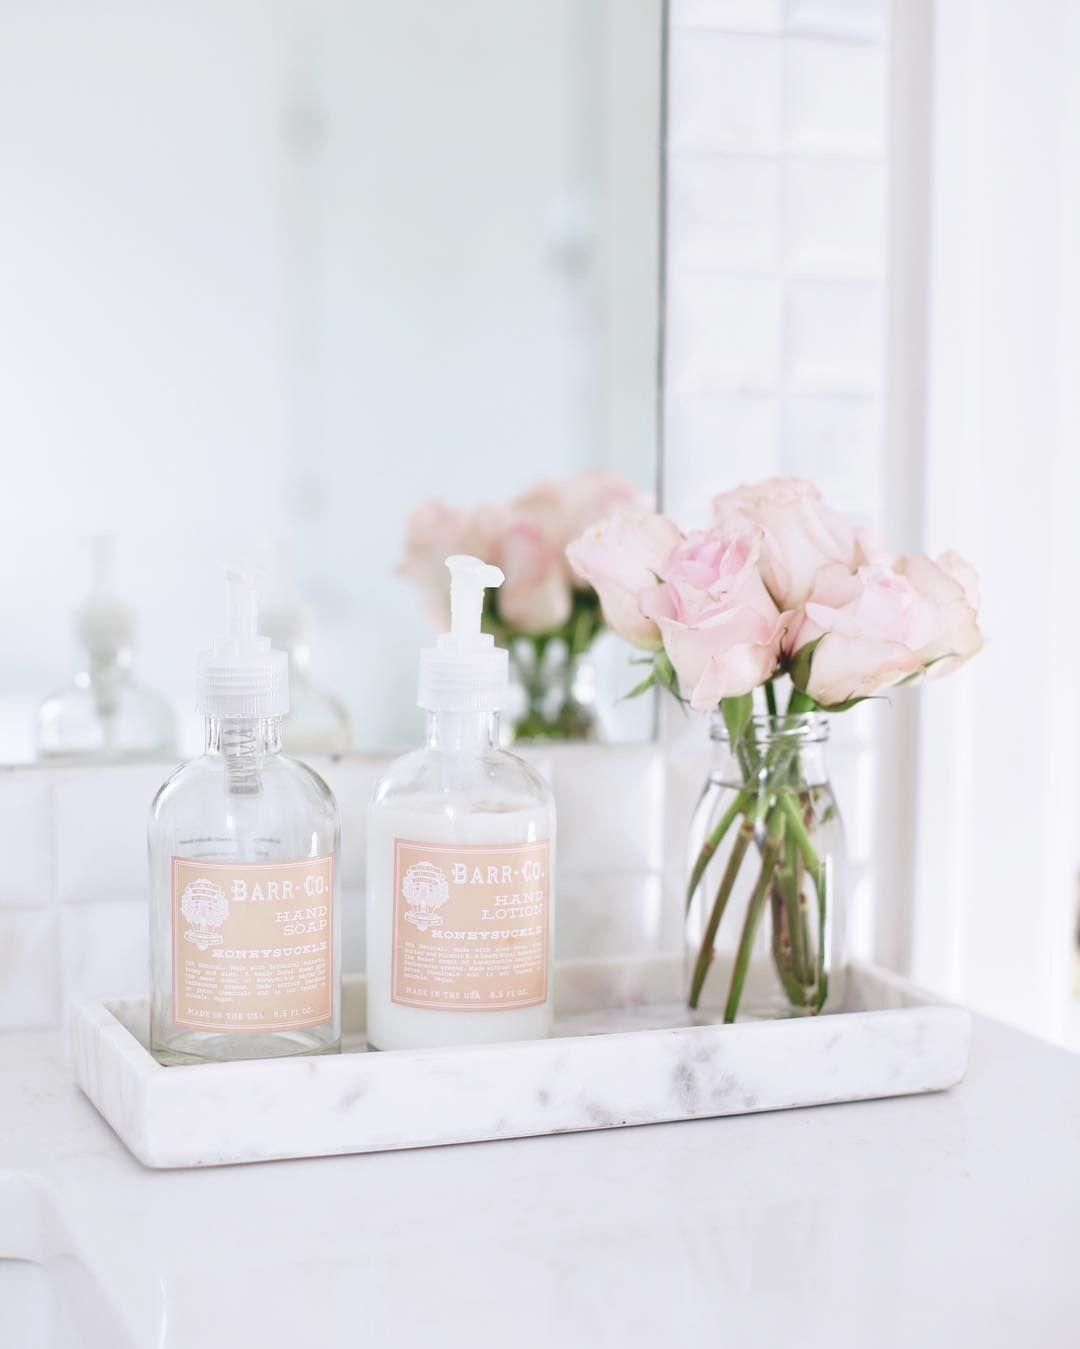 Bathroom Vanity Tray Decor Pinterest Xioohh❥  Home Decor  Pinterest  Apartments